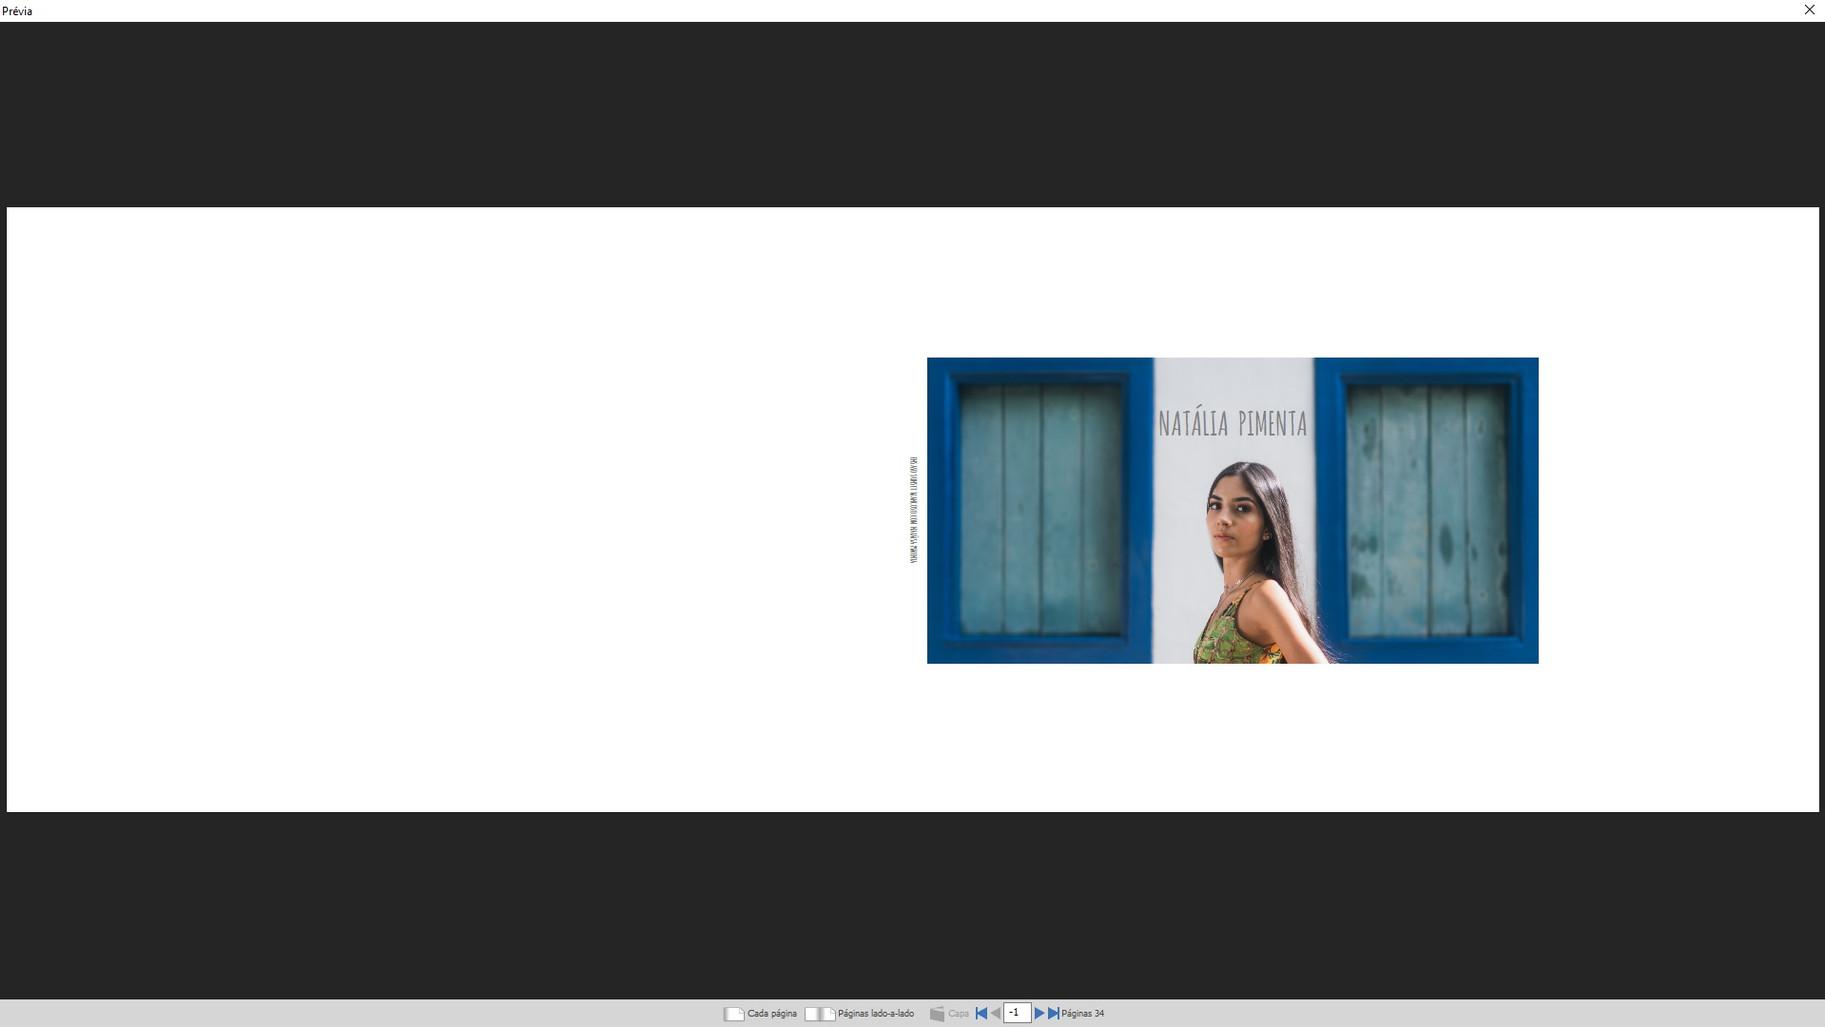 Natalia Pimenta Album capa e contracapa.